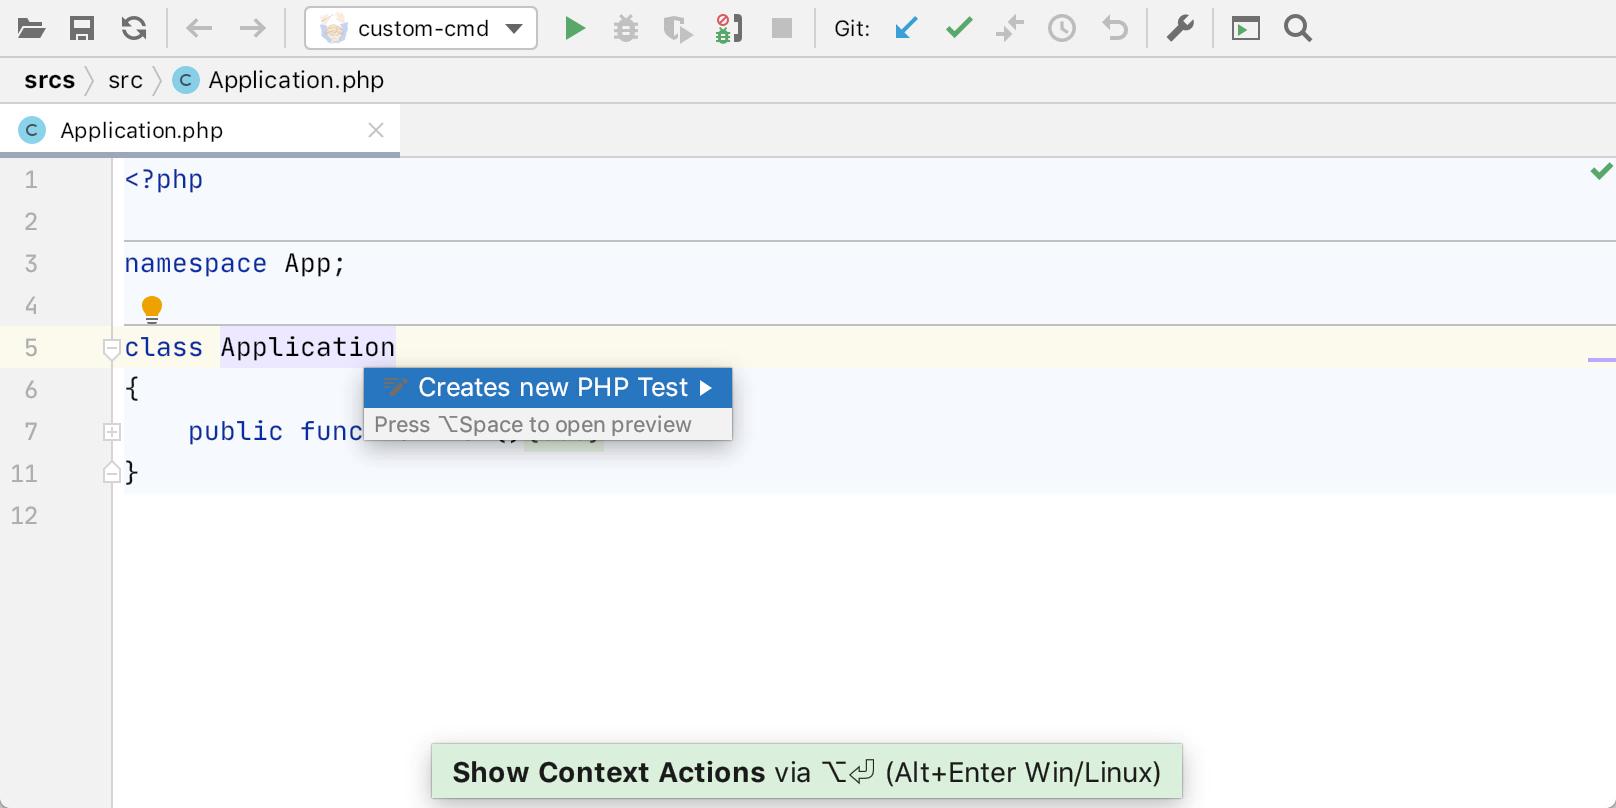 phpunit_create_test@2x